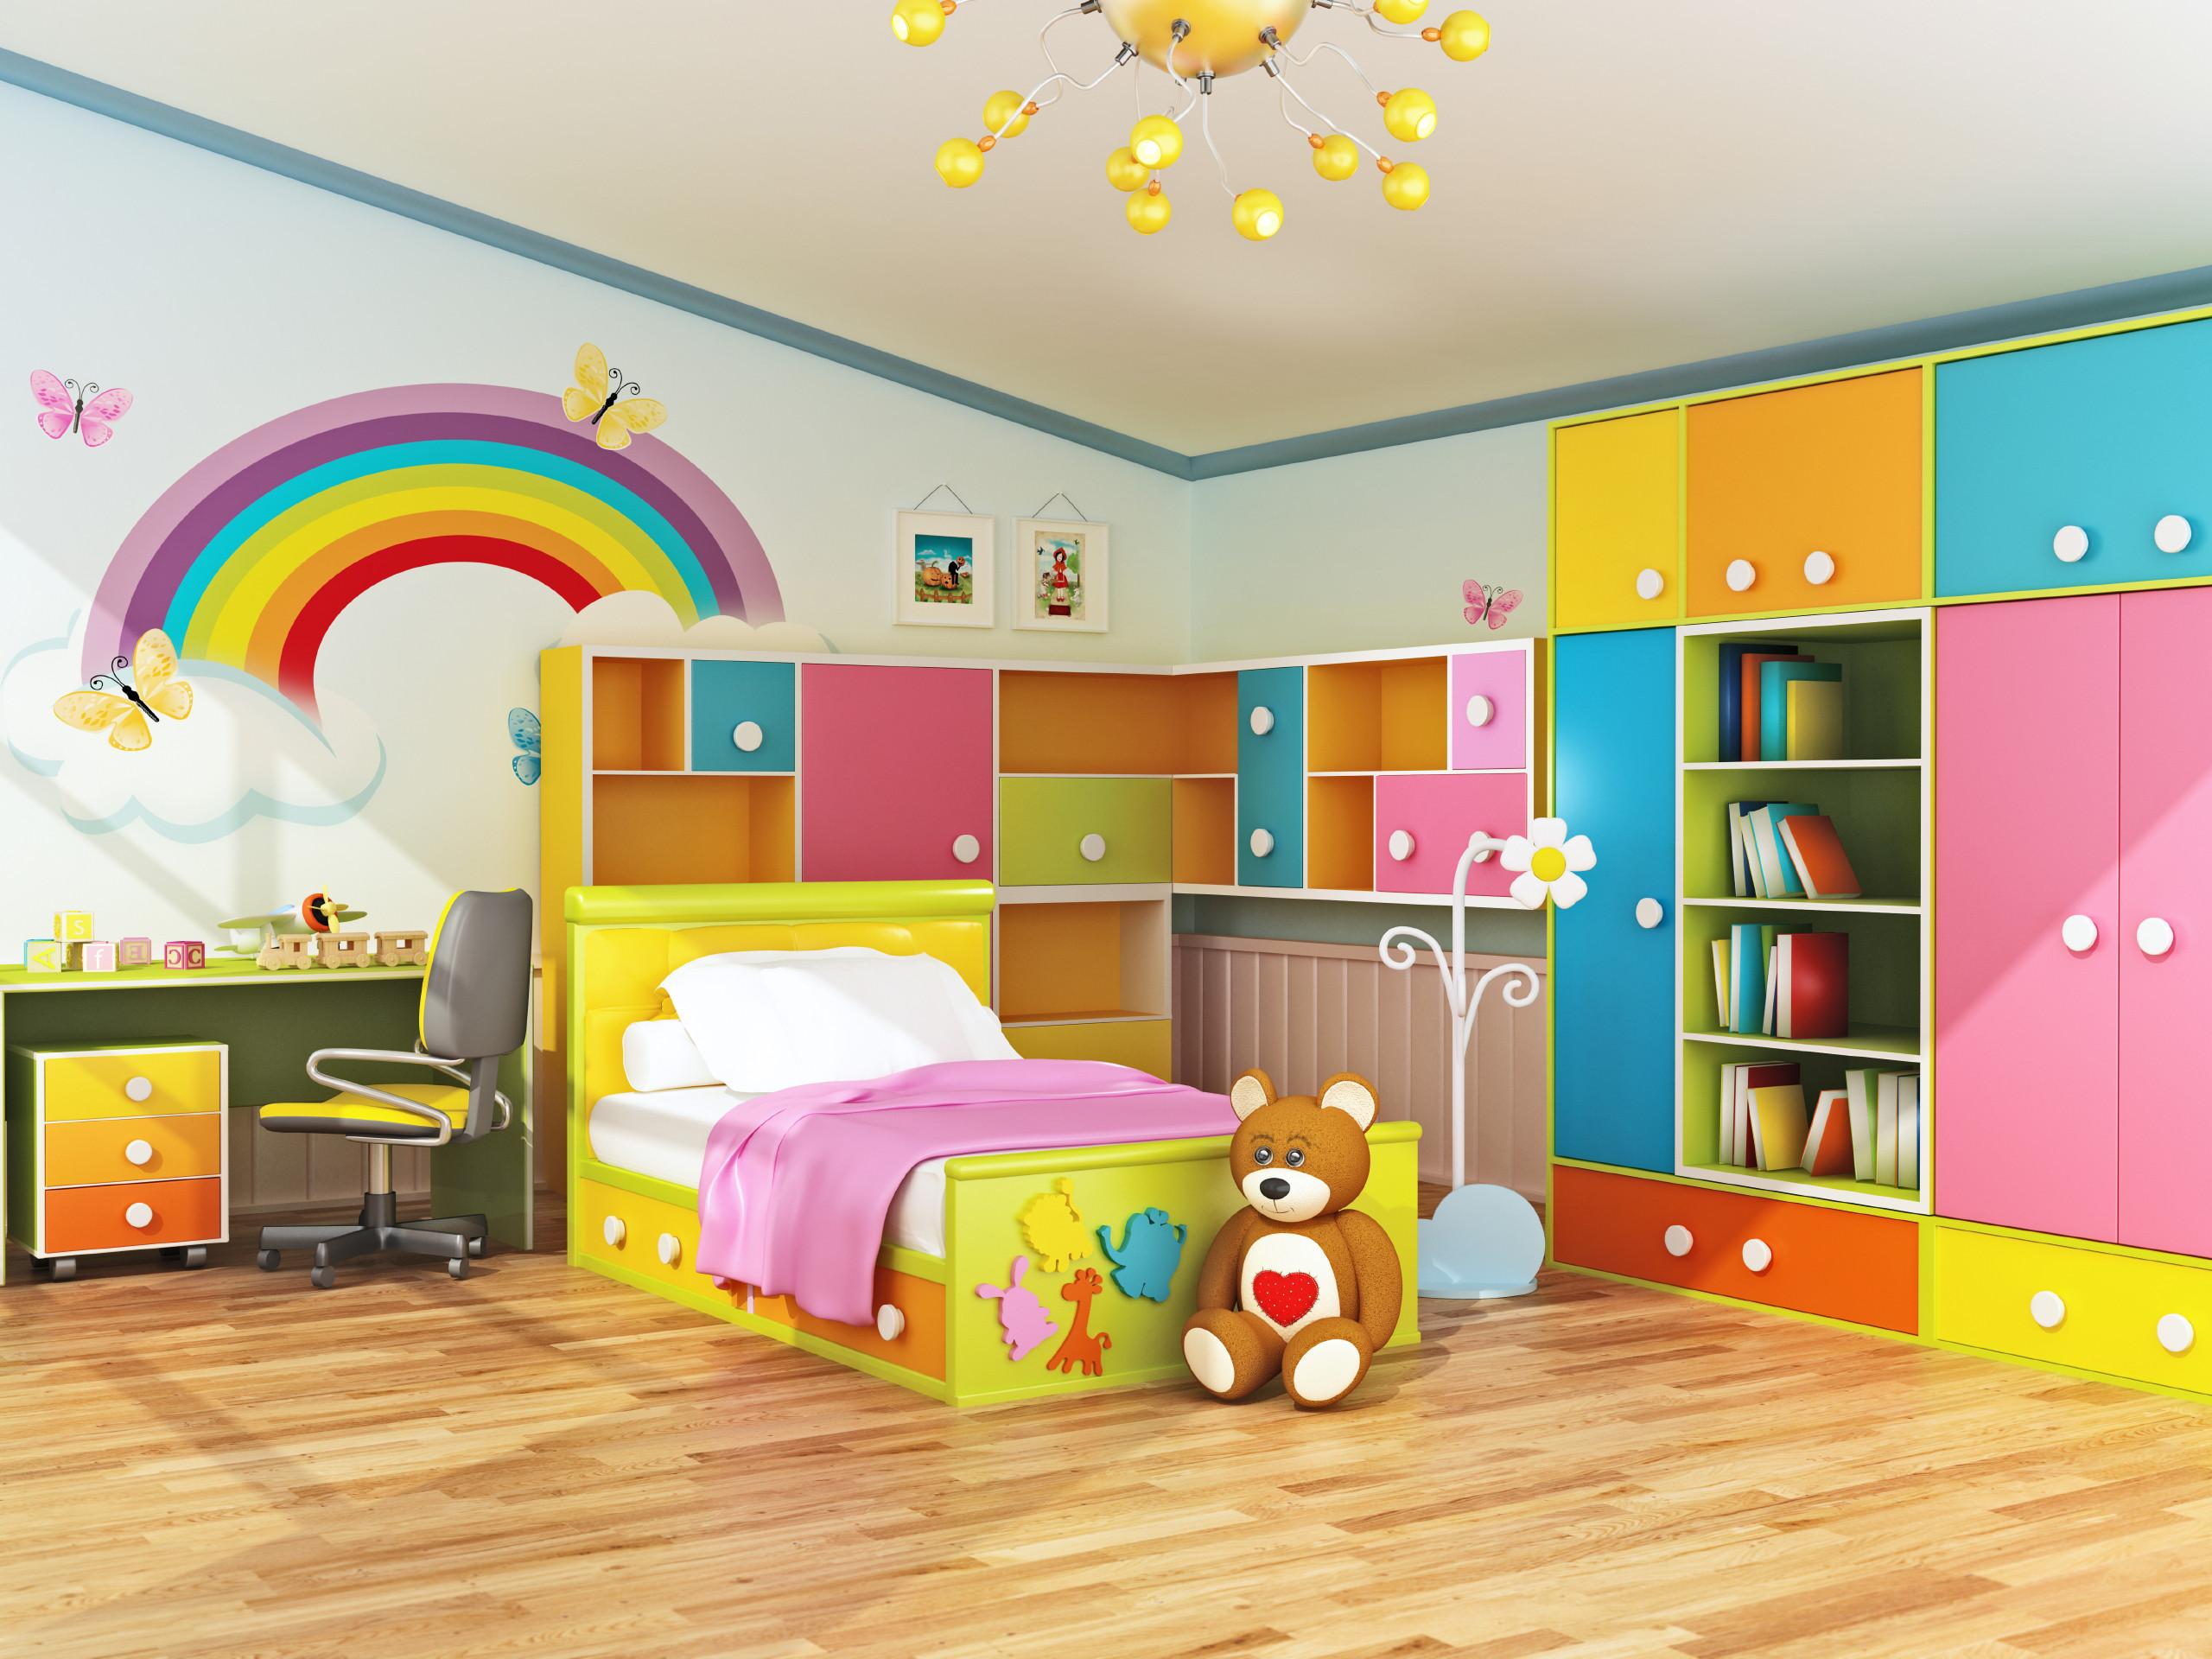 Kids Room Interior  Plan Ahead When Decorating Kids Bedrooms